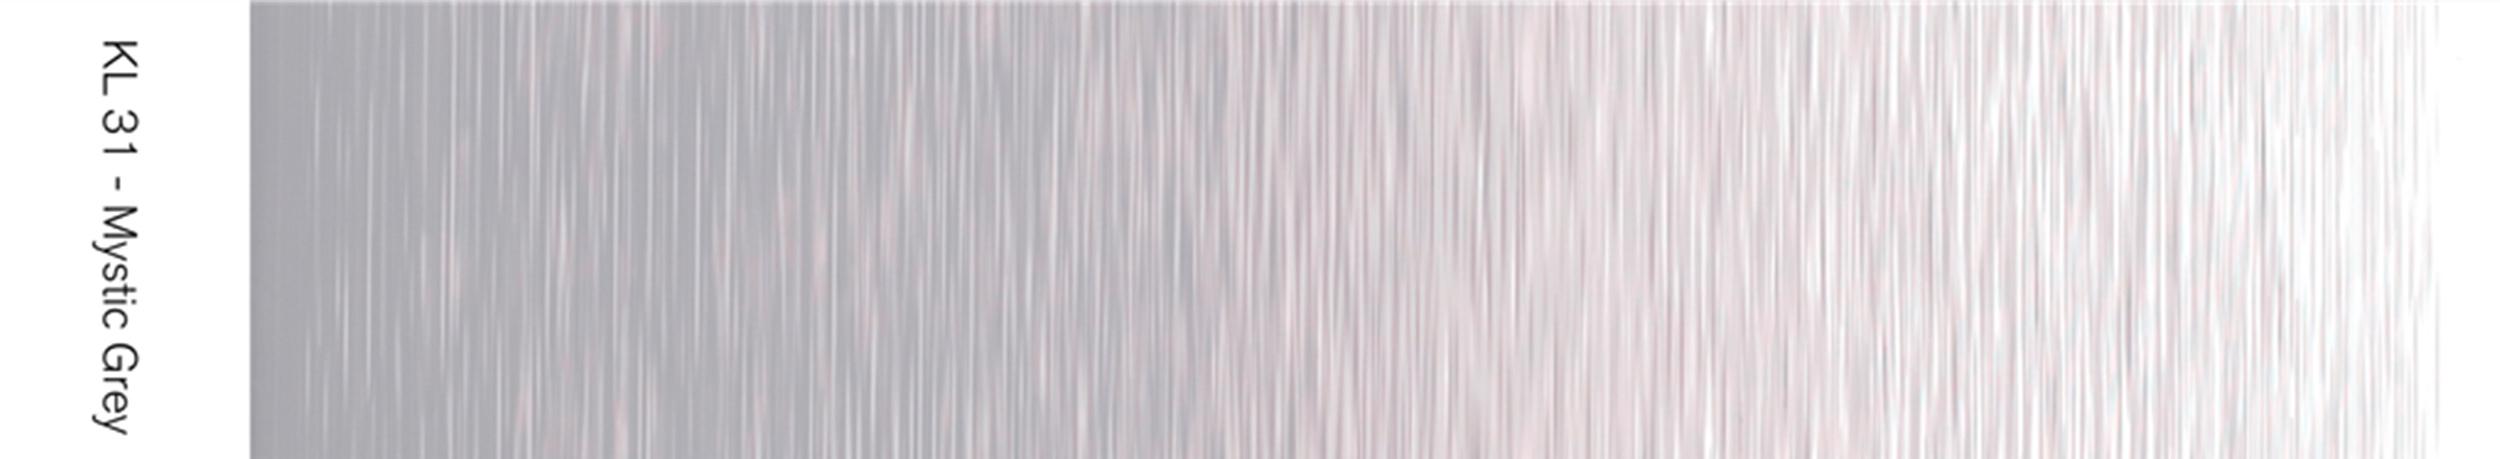 doekkleuren mystic grey thule omnistor luifels cannenburg